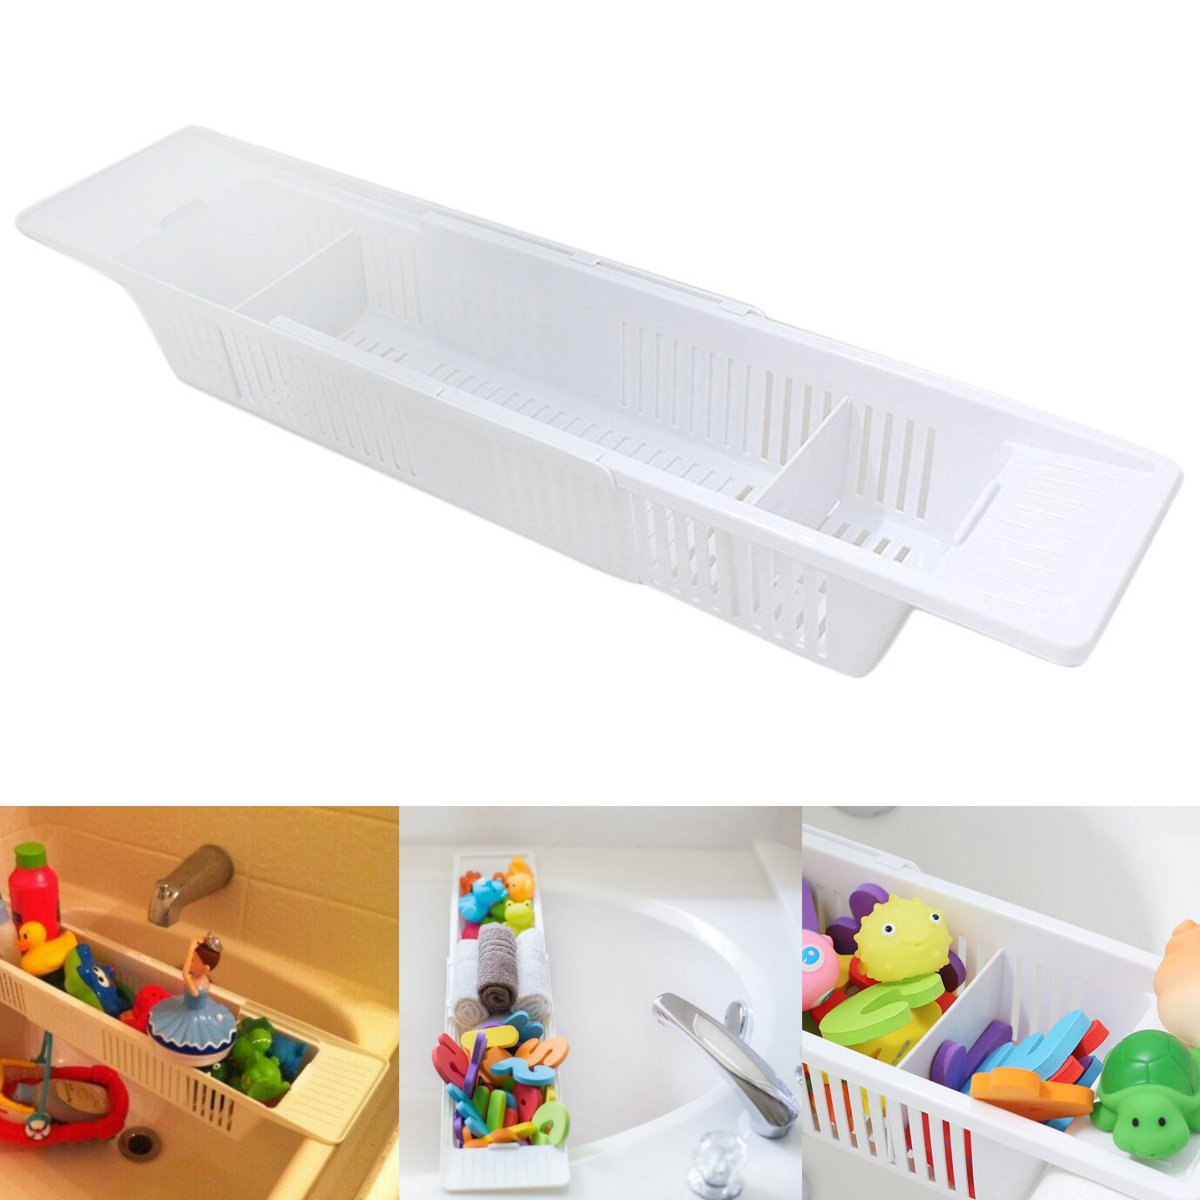 plastic retractable bath tub shower kids toys storage basket organizer bath towels storage holder anti slip